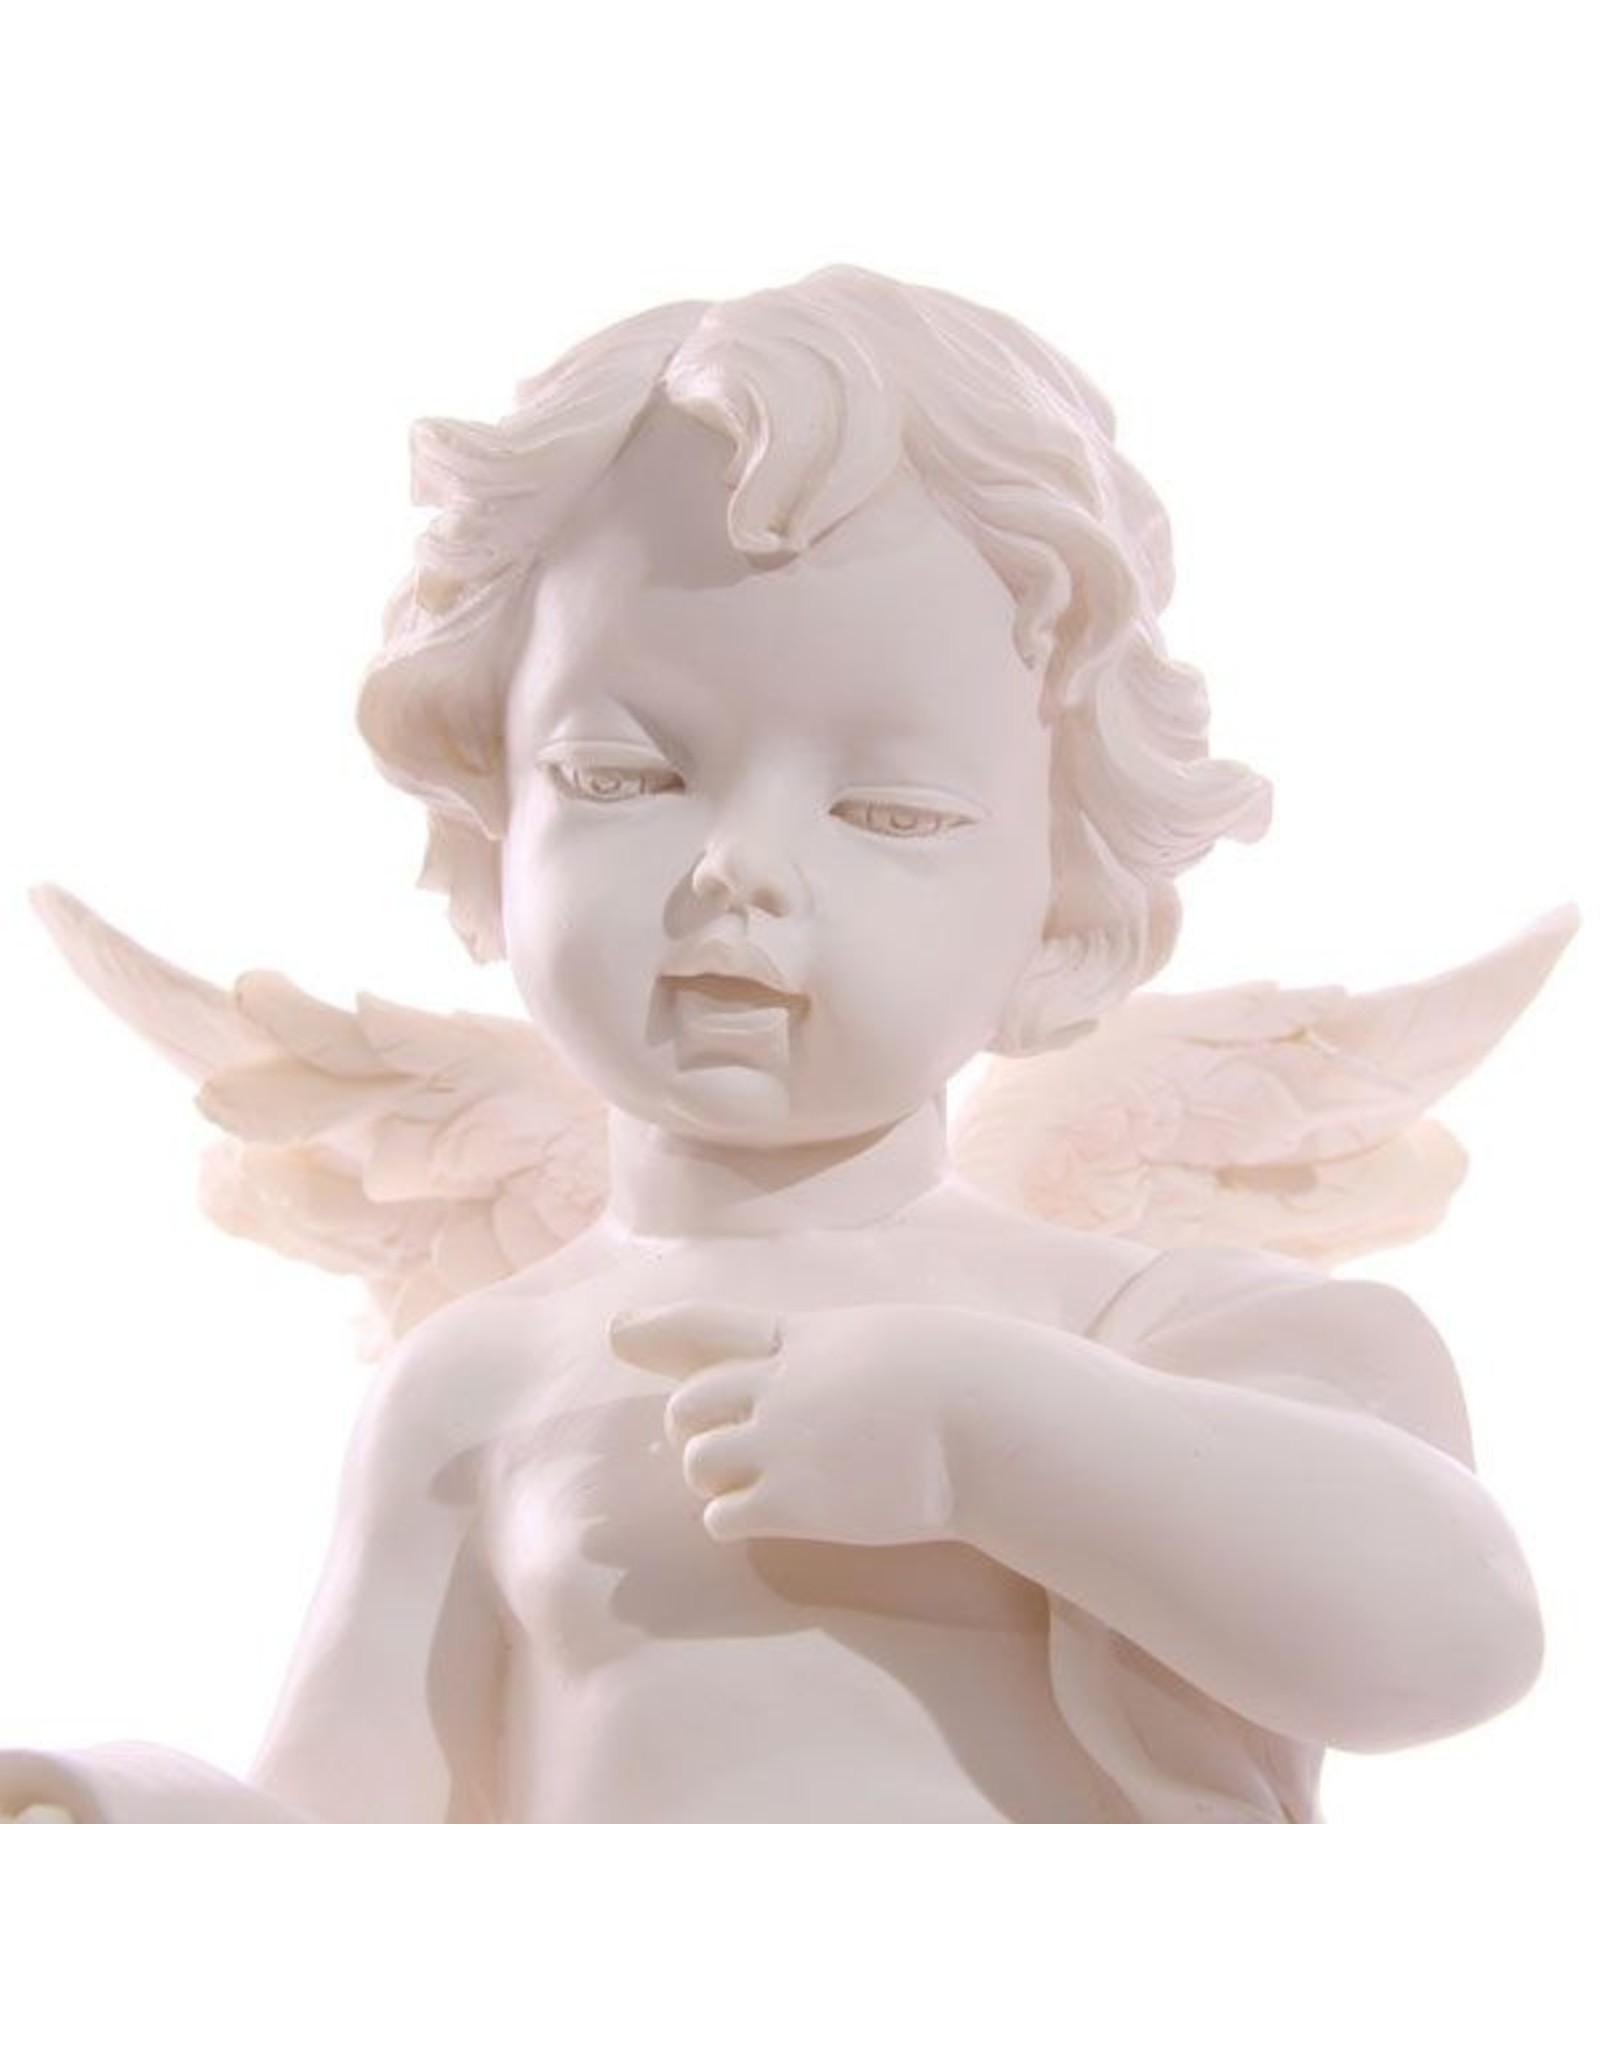 Engel zittend op pilaar